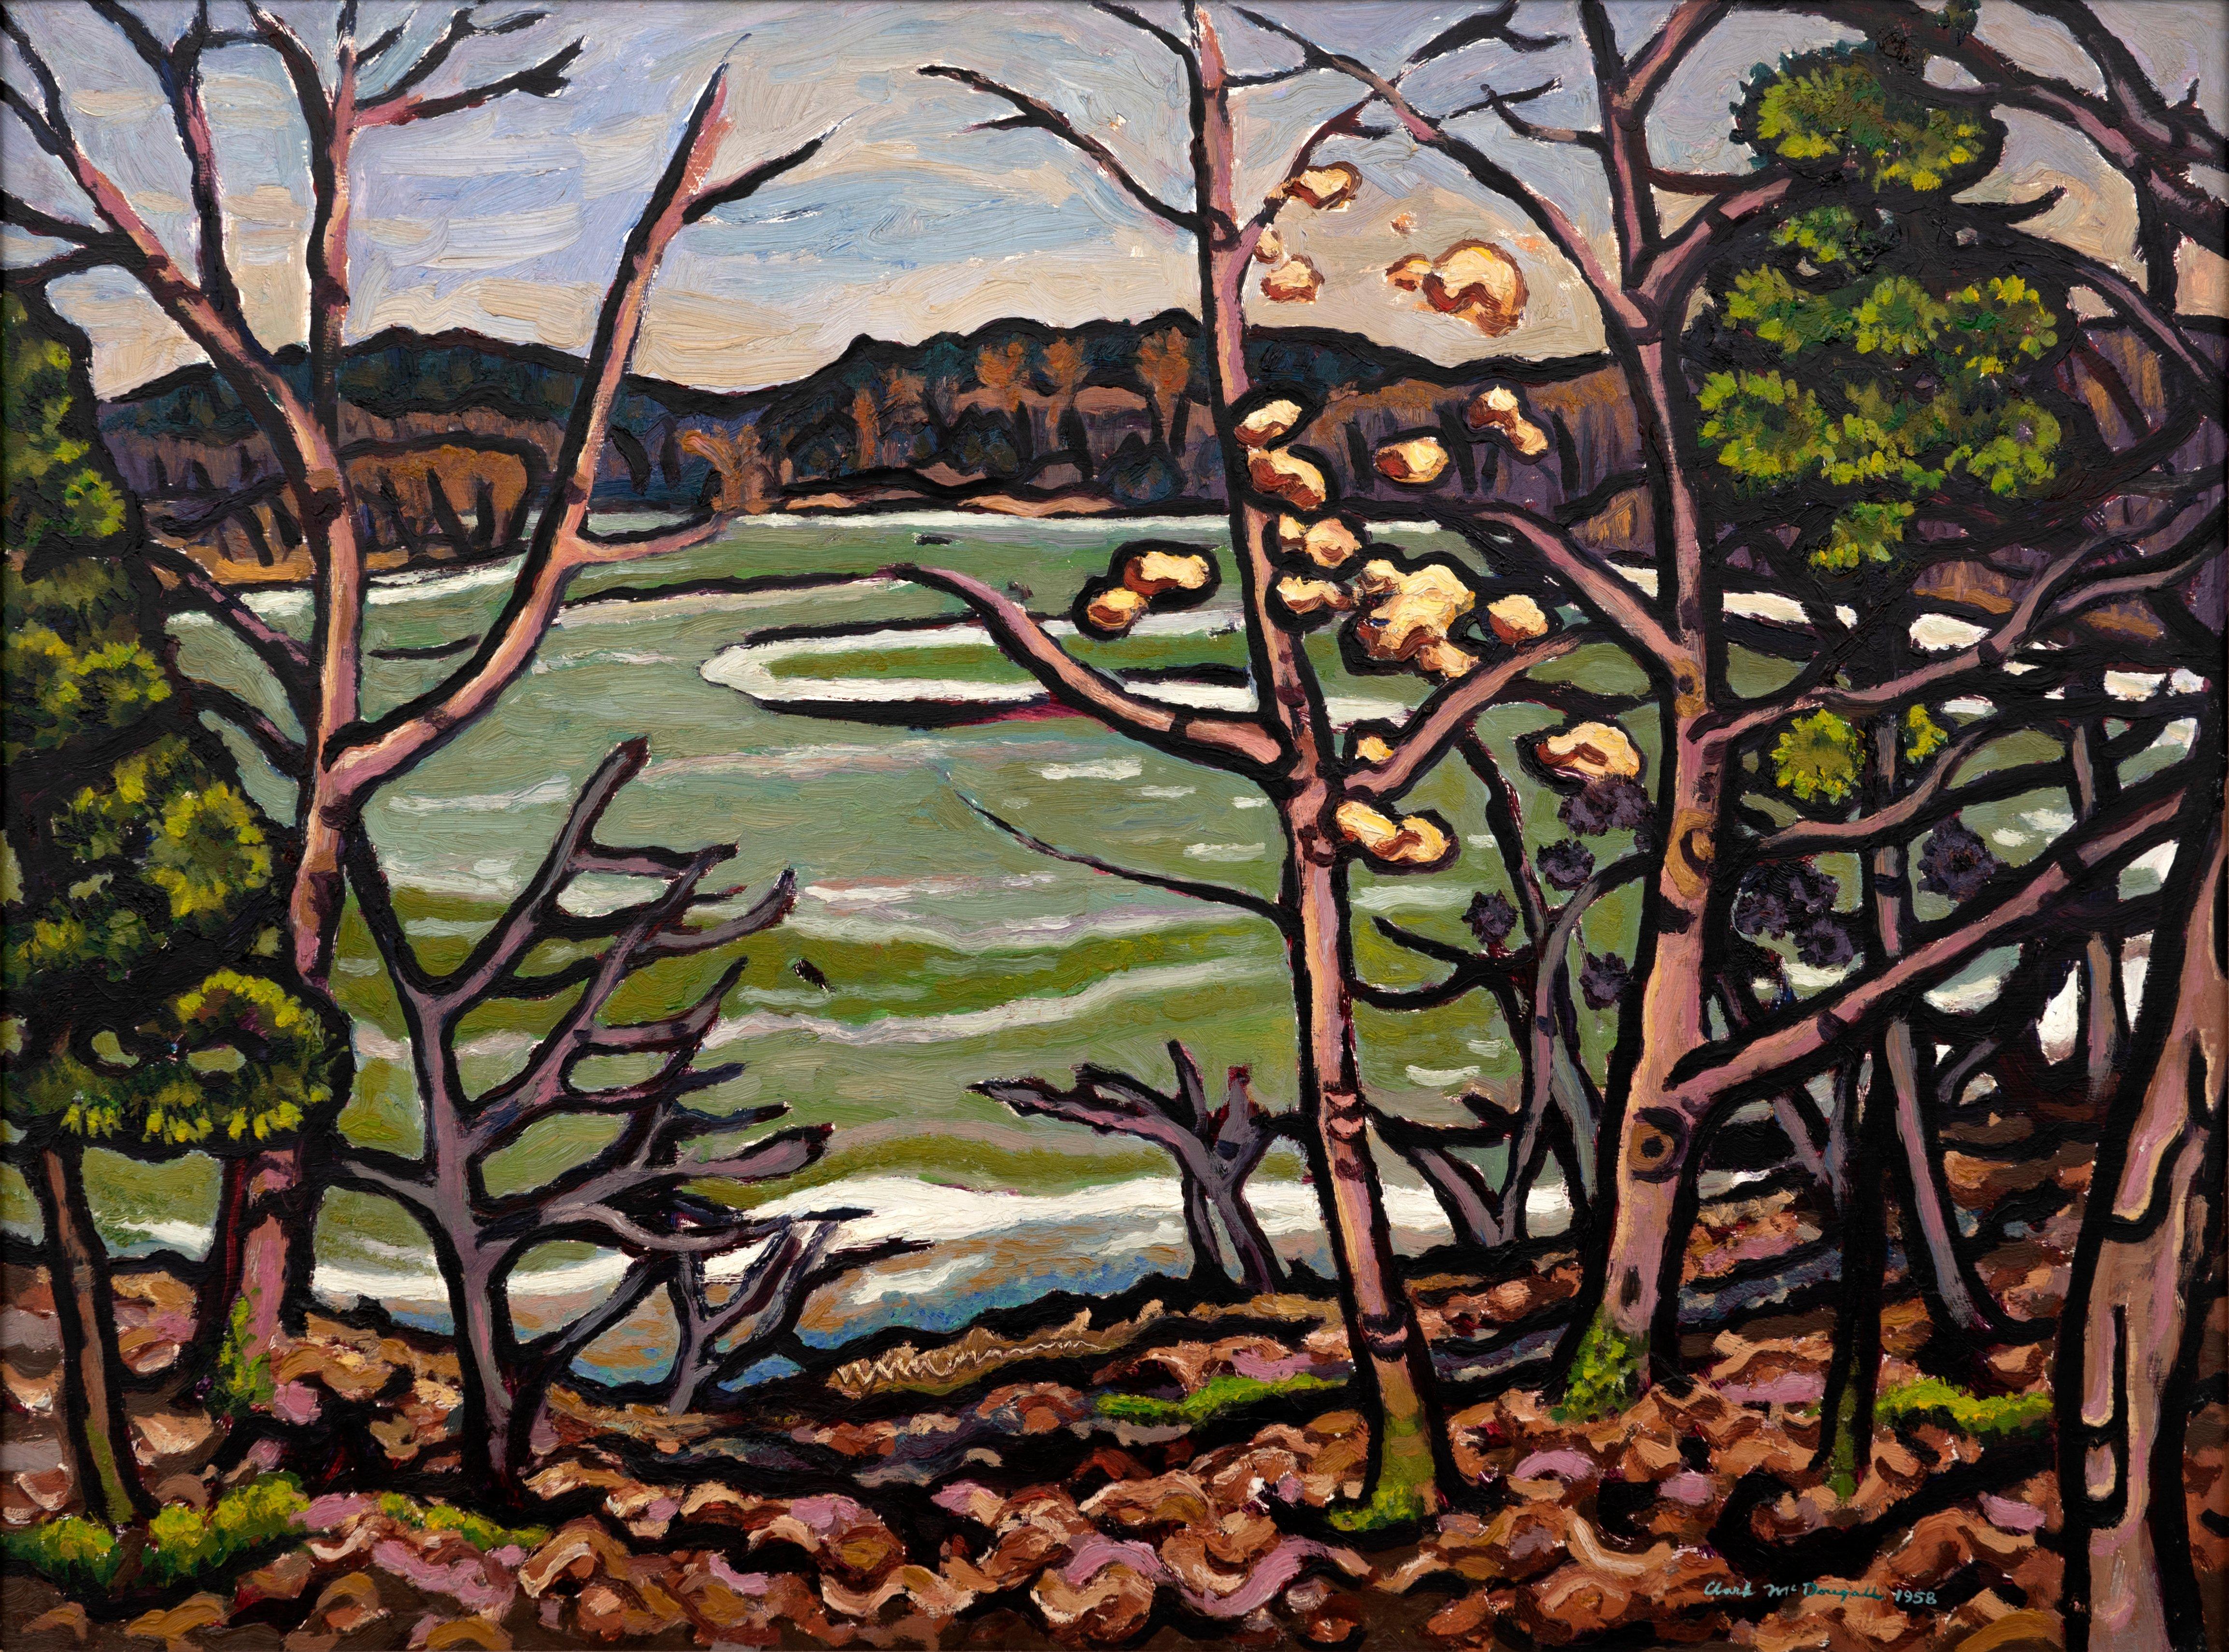 Artist: Clark McDougall, Above the Lookout Reservoir, 1958, Oil on panel